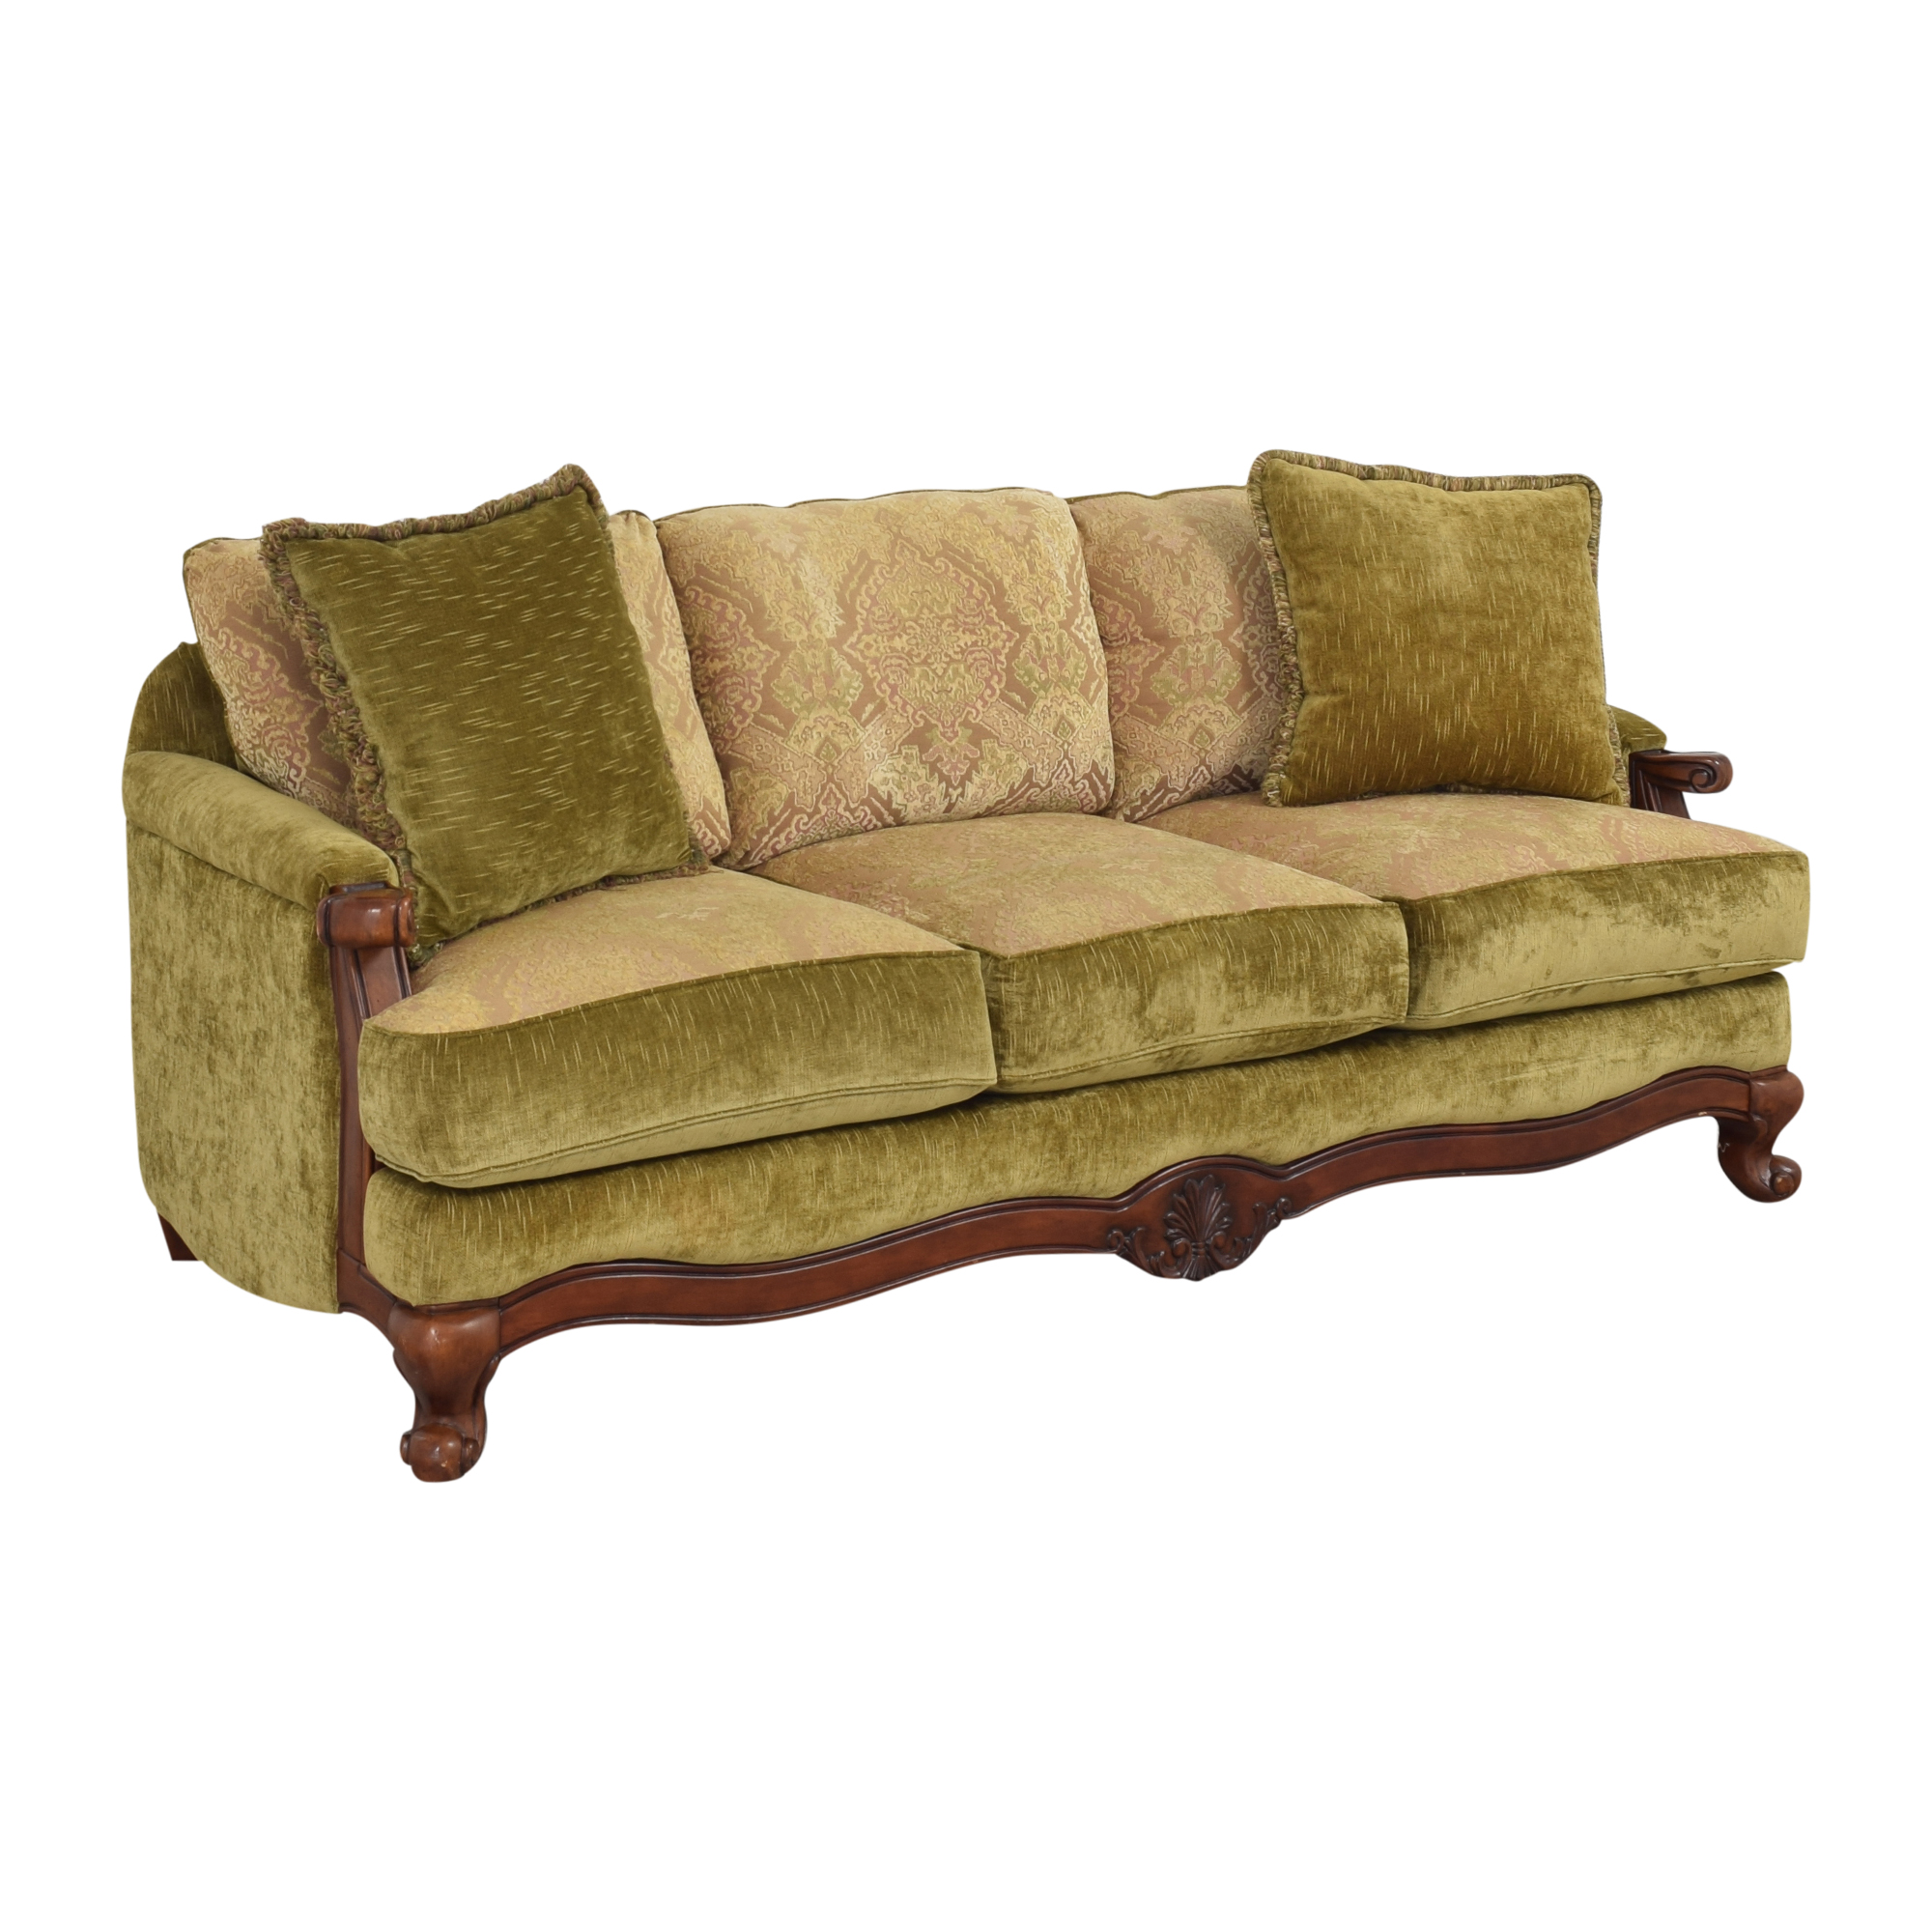 Ashley Furniture Ashley Furniture Three Cushion Sofa